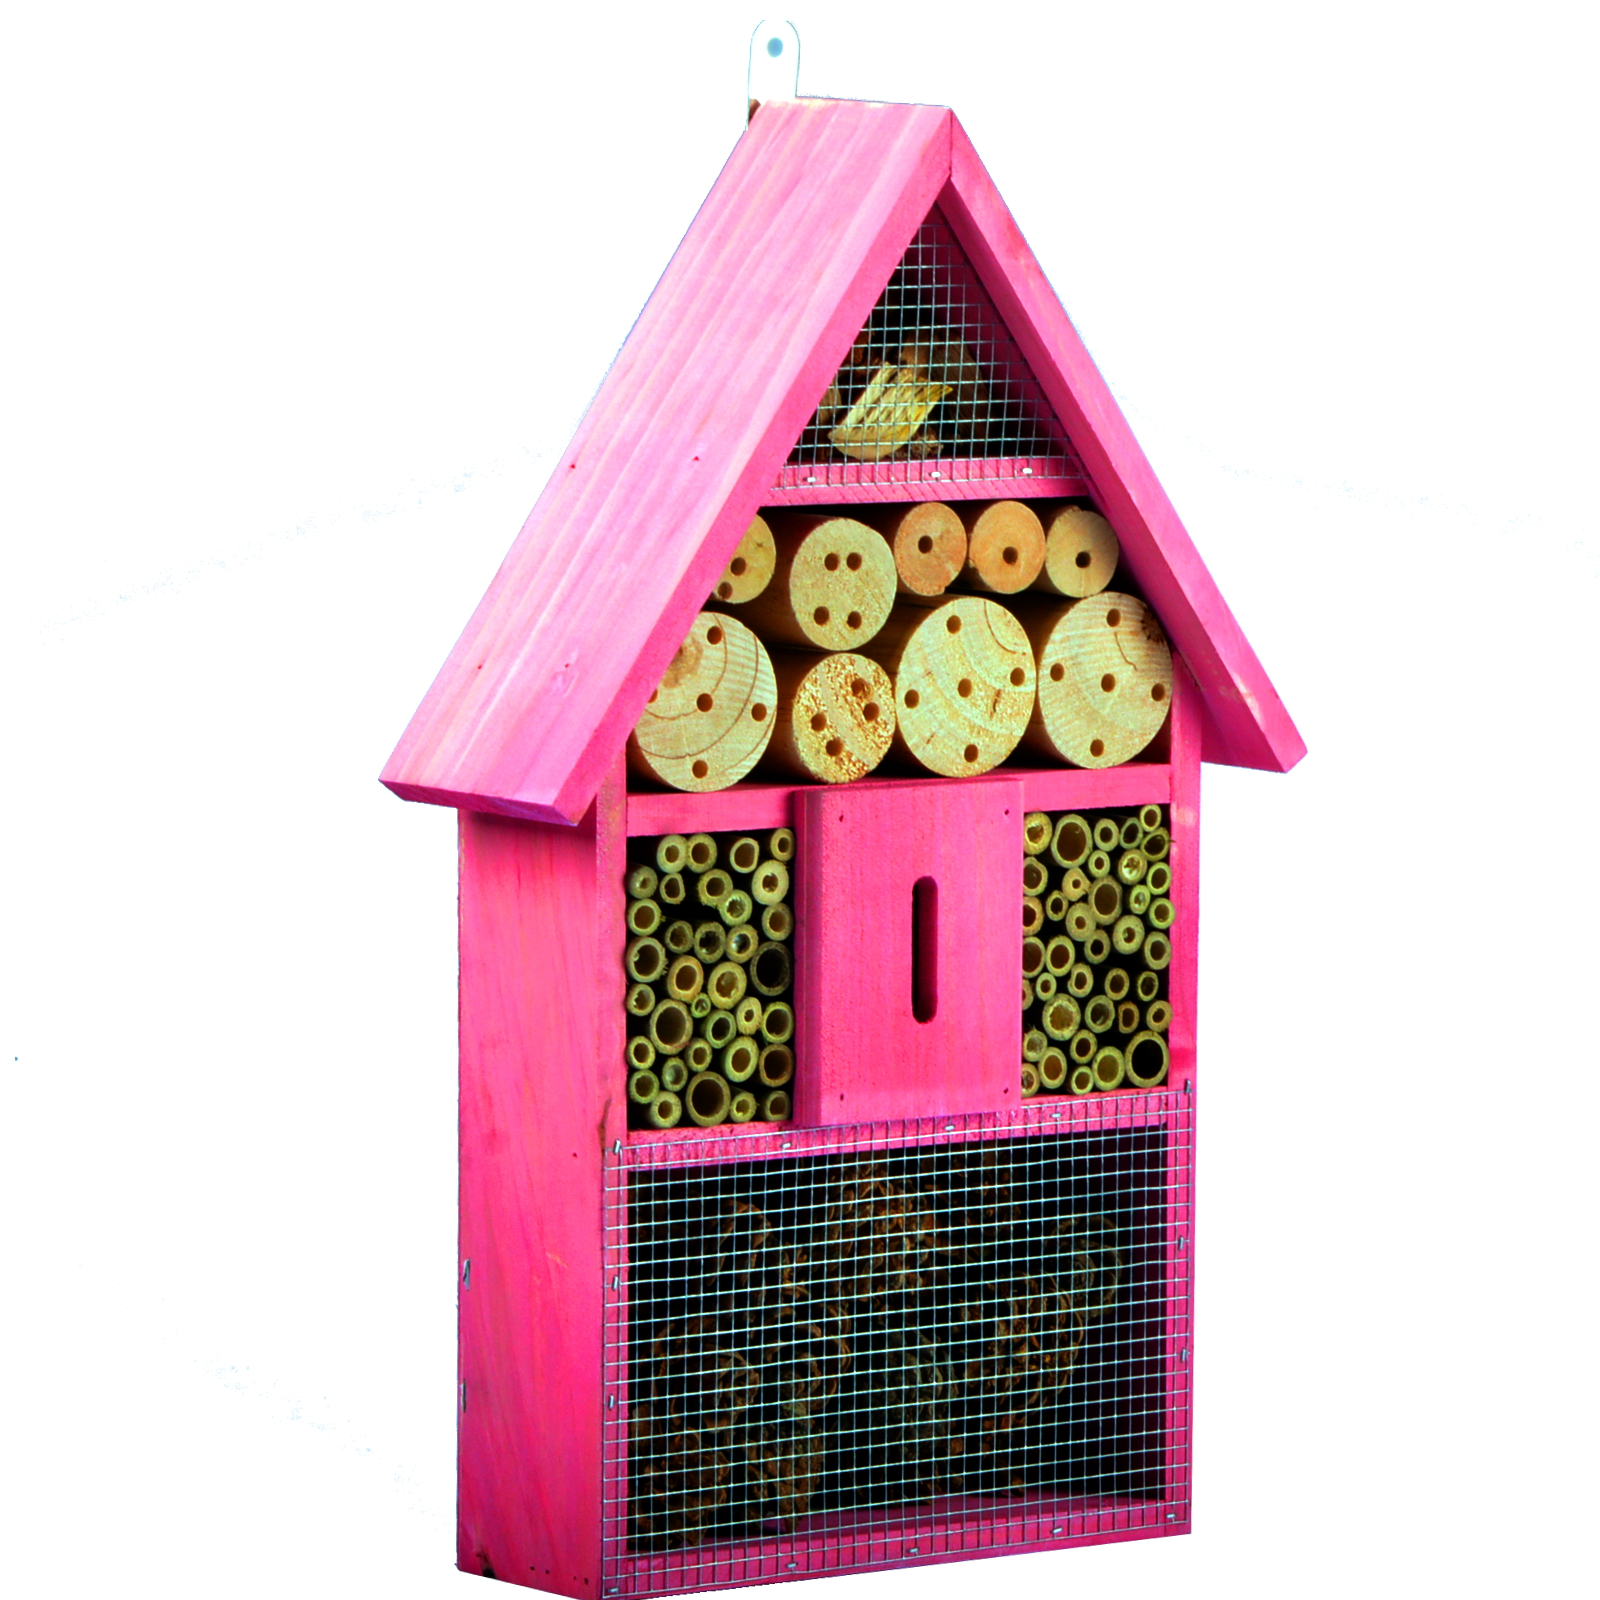 2 tailles h tel insectes incubateur nichoir oiseau jardin ebay. Black Bedroom Furniture Sets. Home Design Ideas